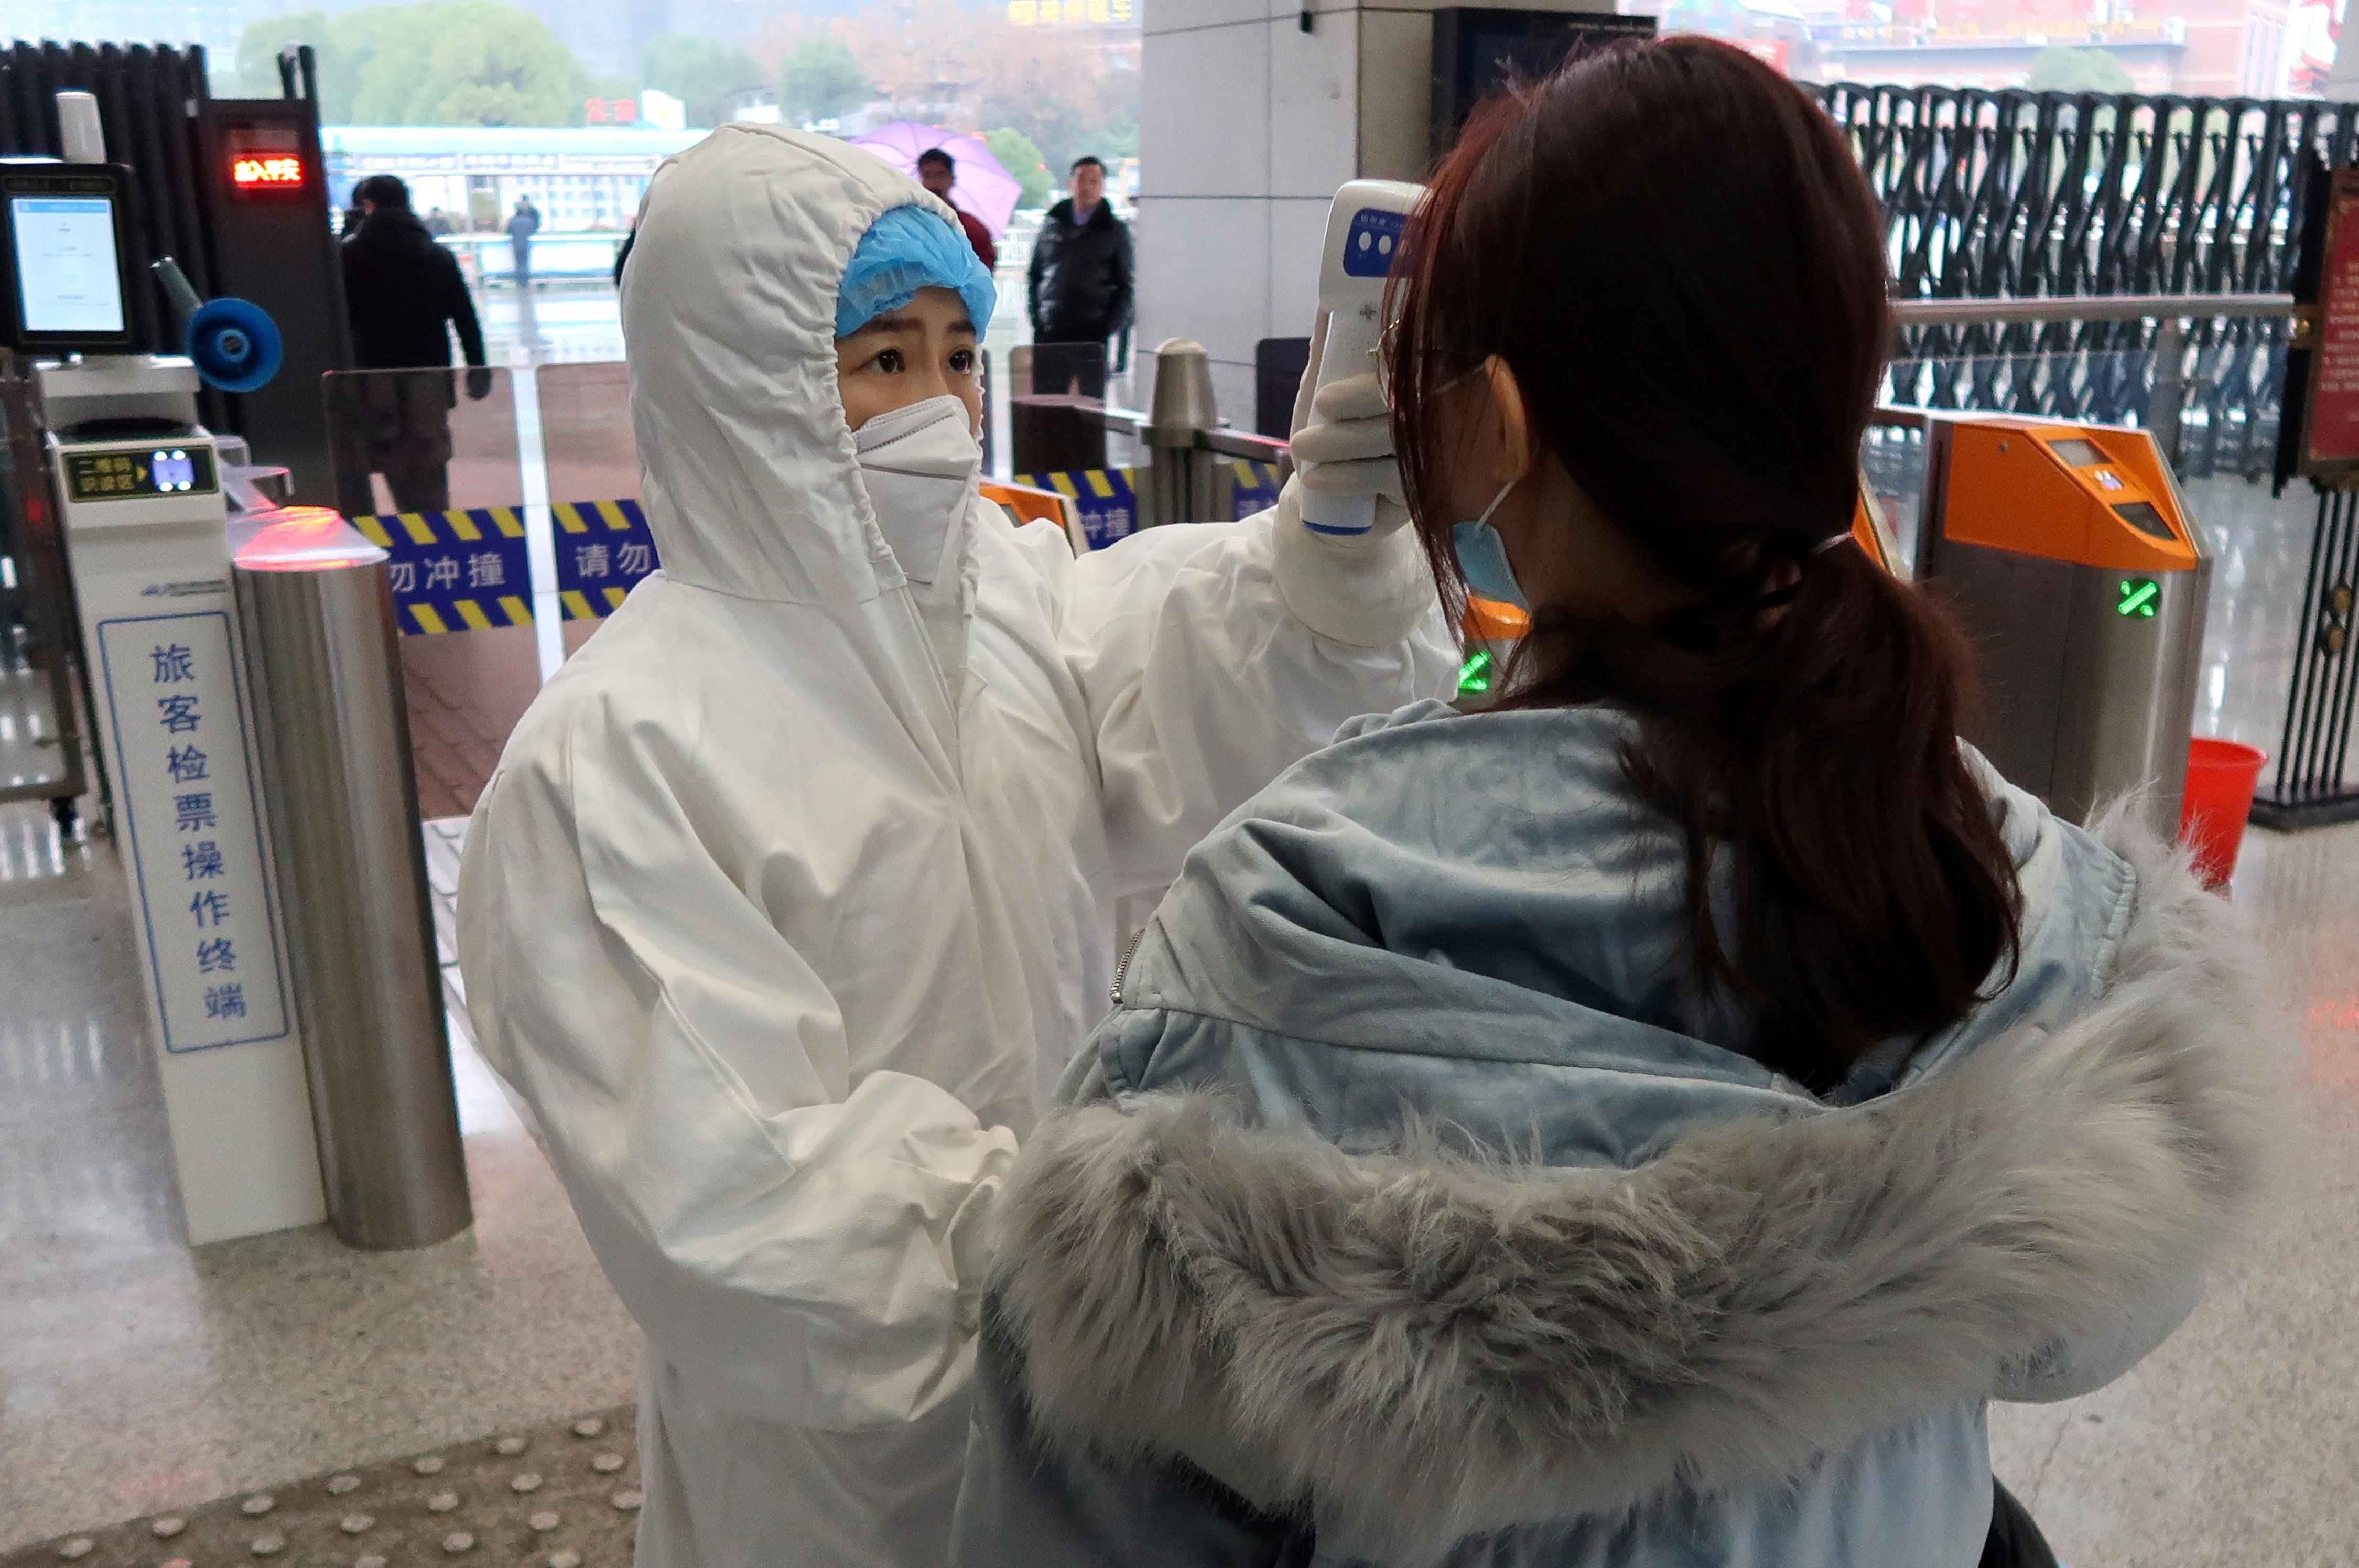 China shuts transport, temples, Disneyland as virus toll rises to 25